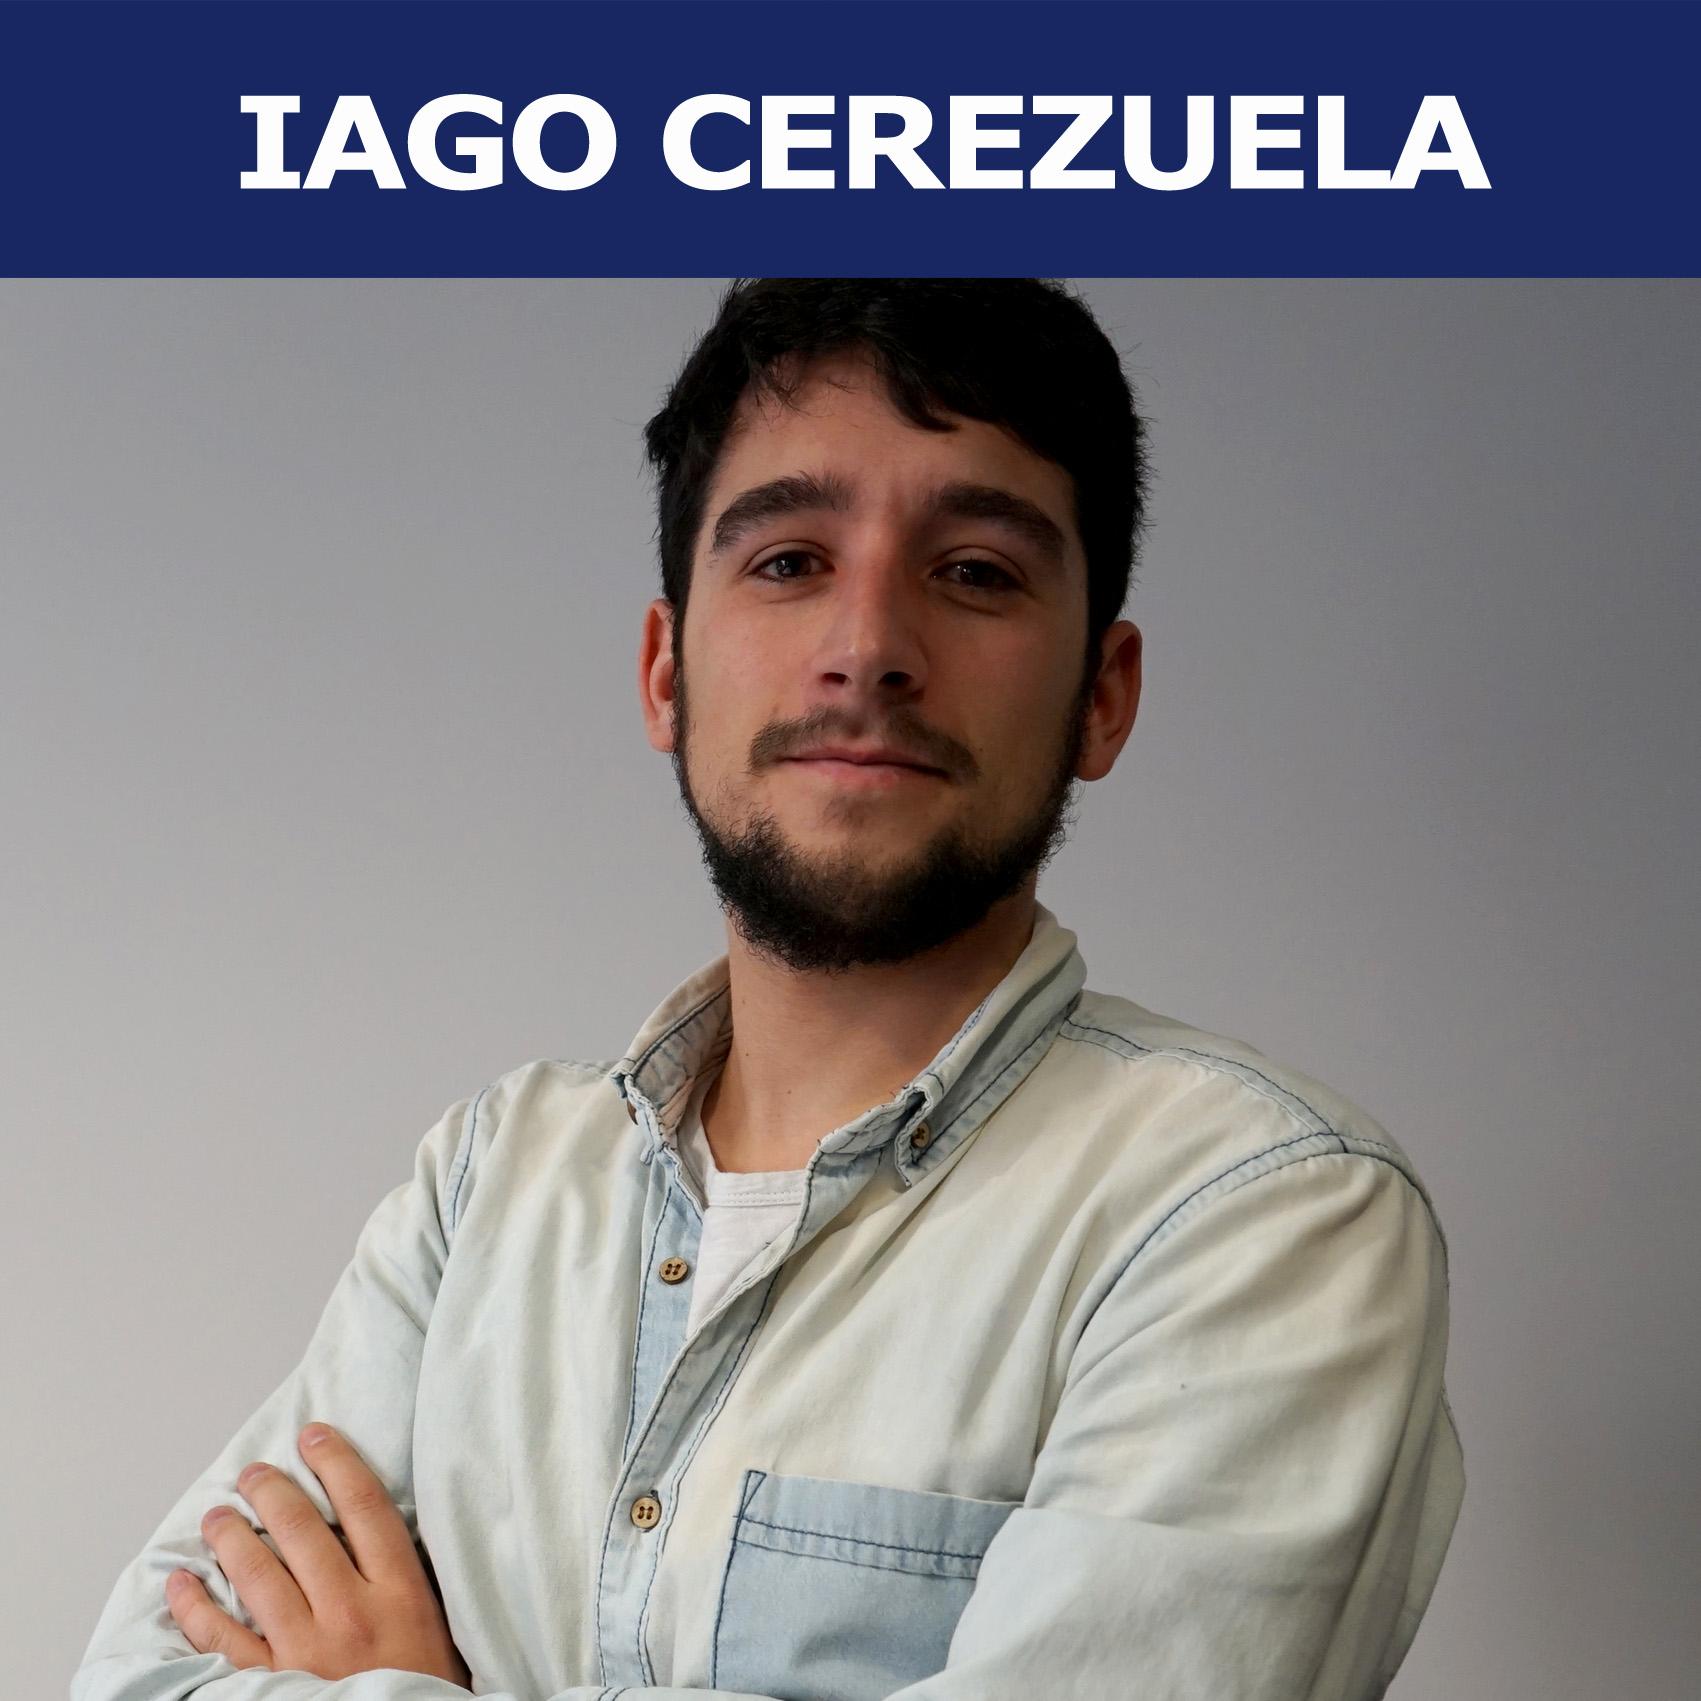 Iago Cerezuela, xornalista